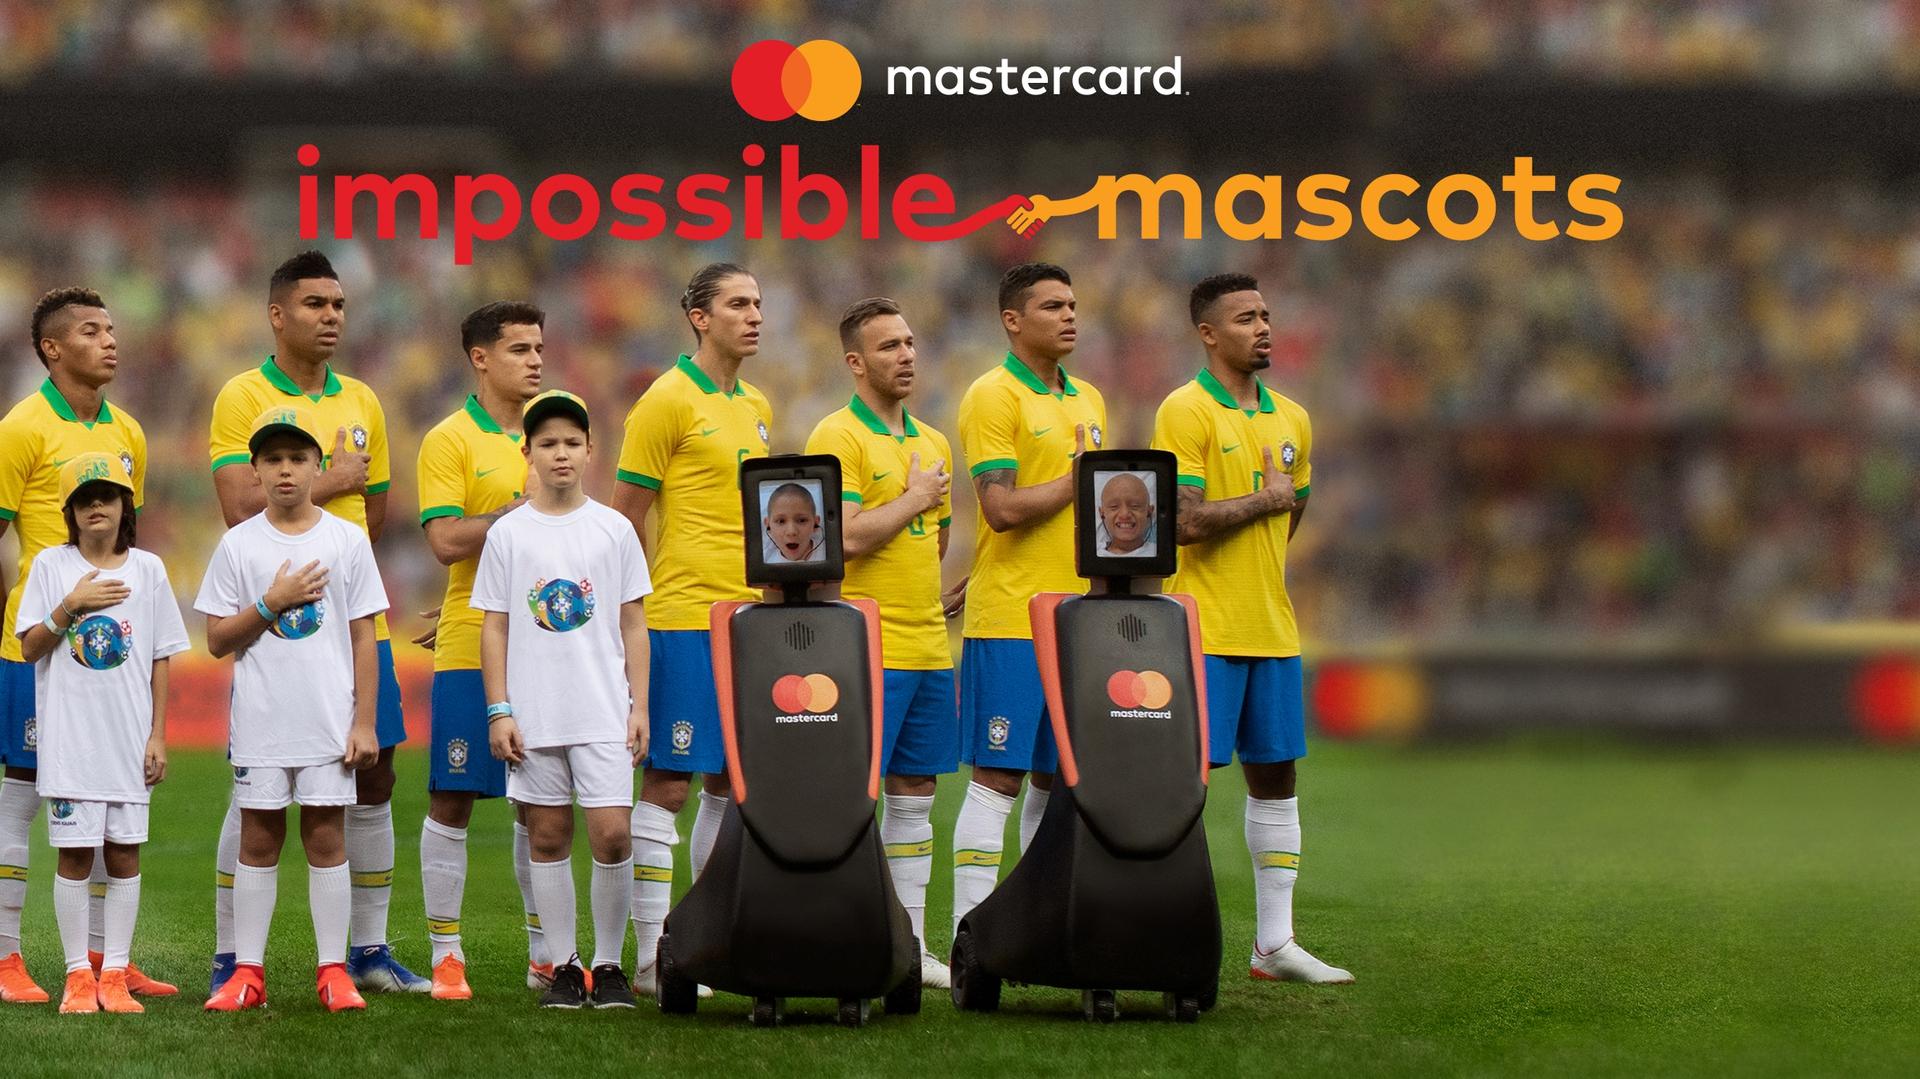 Impossible Mascots